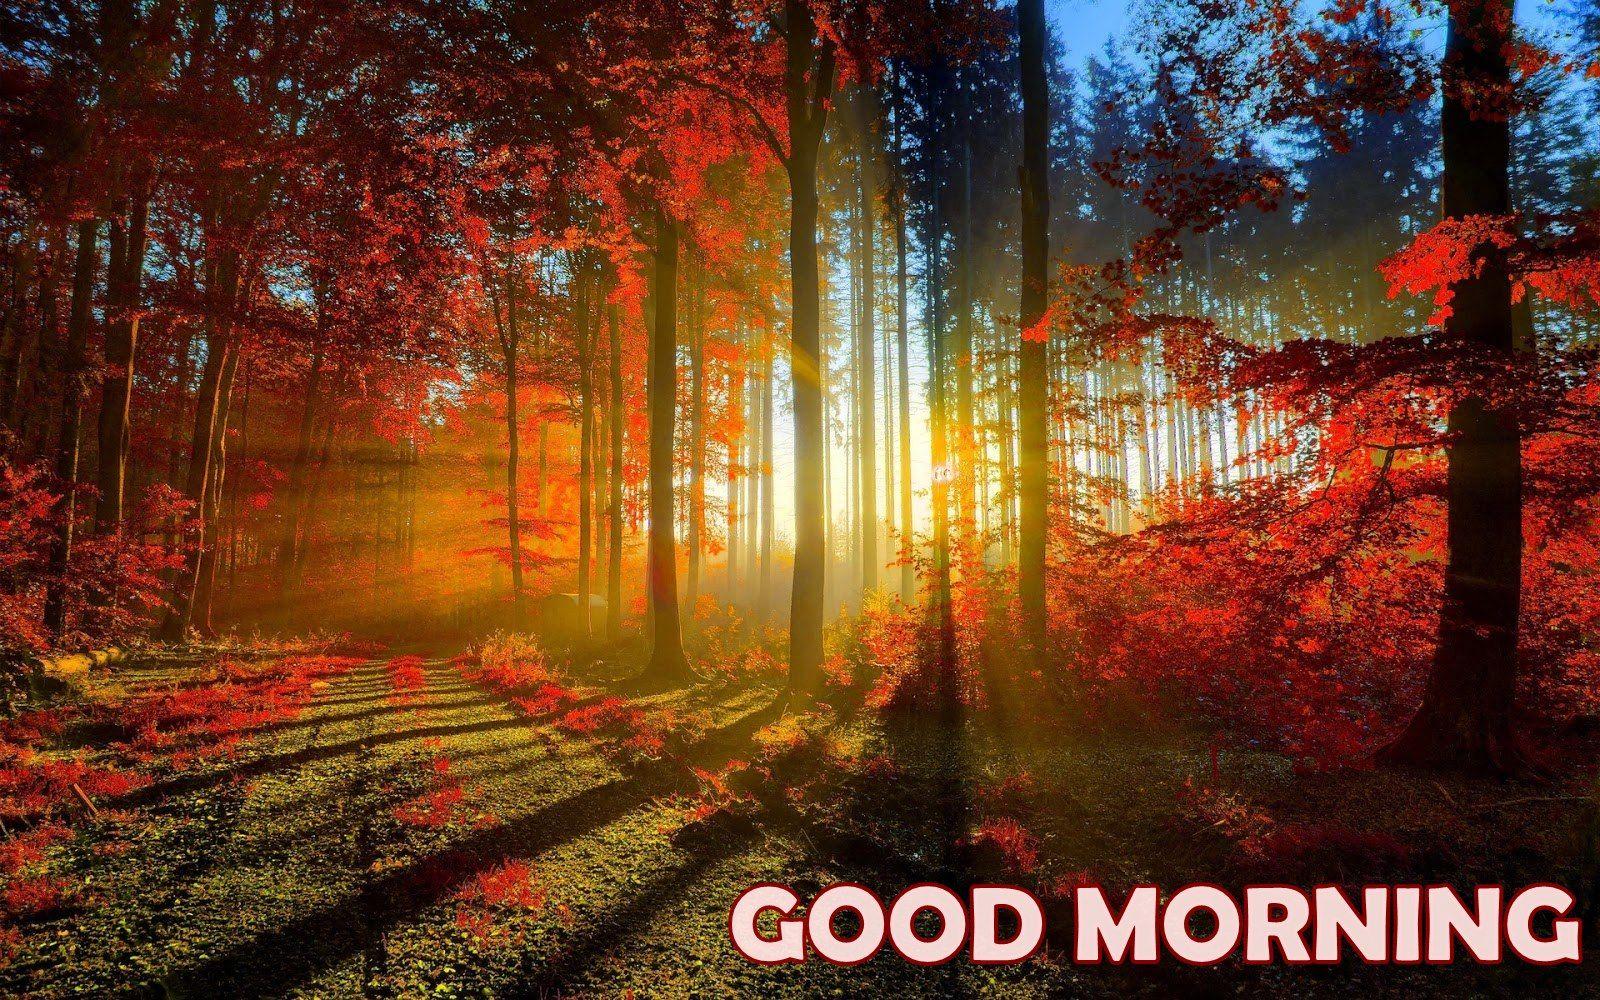 Beautiful Good Morning Nature Wallpaper 07271 Wallpaperspick Com Scenery Wallpaper Landscape Wallpaper Autumn Scenery